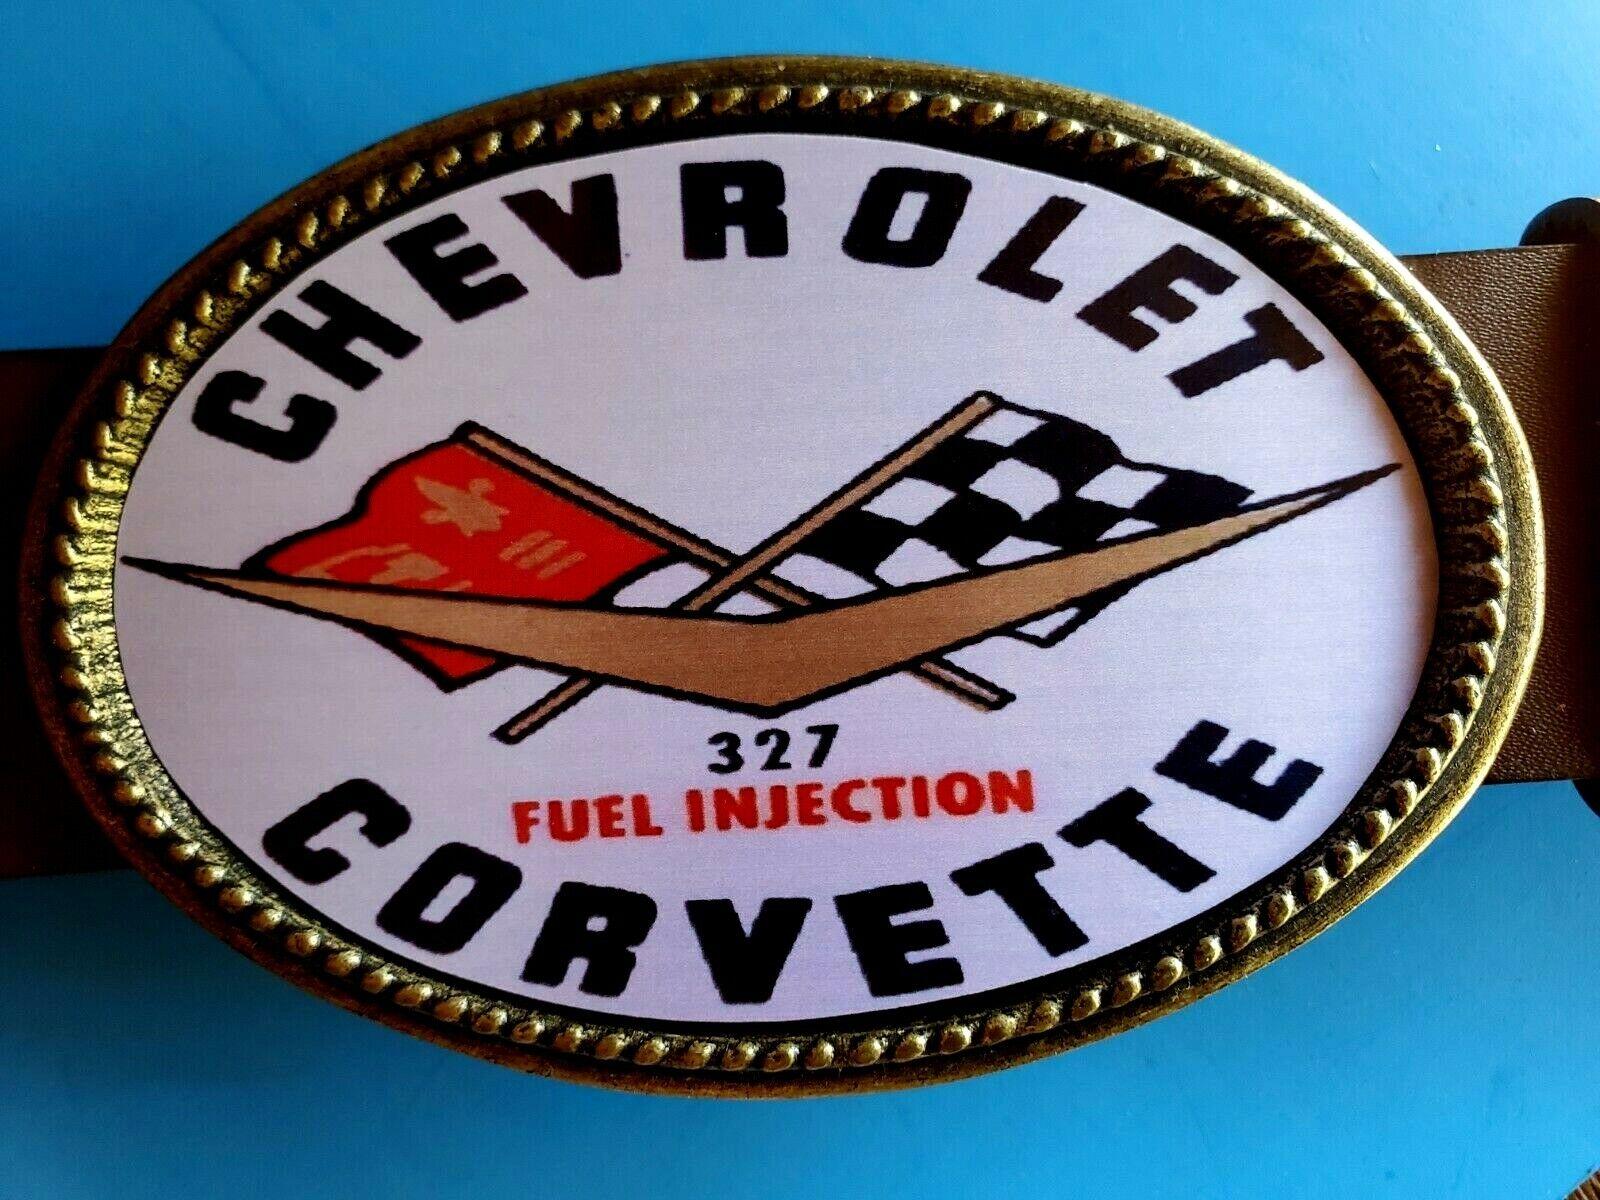 <<<CORVETTE 327 Fuel Injected>> Epoxy Photo Buckle